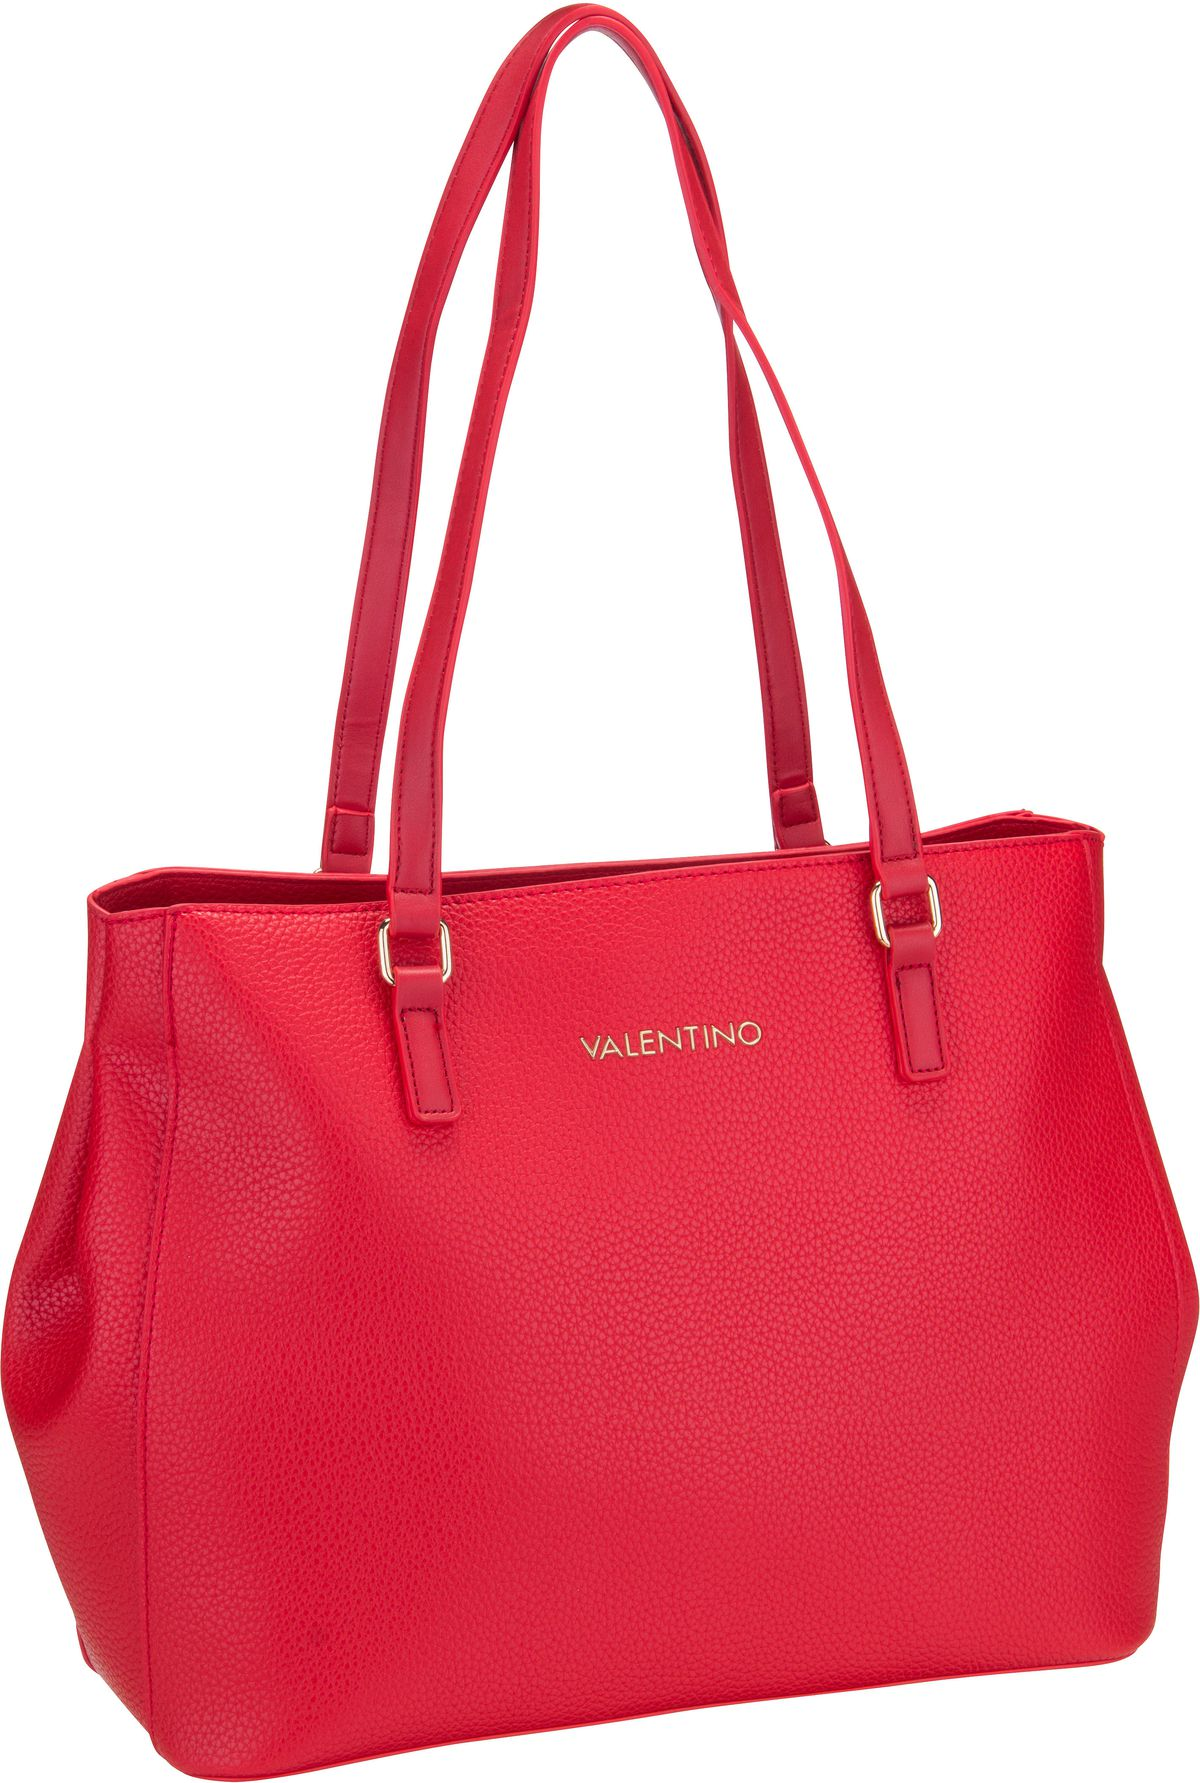 Bags Shopper Superman Shopping U801 Rosso